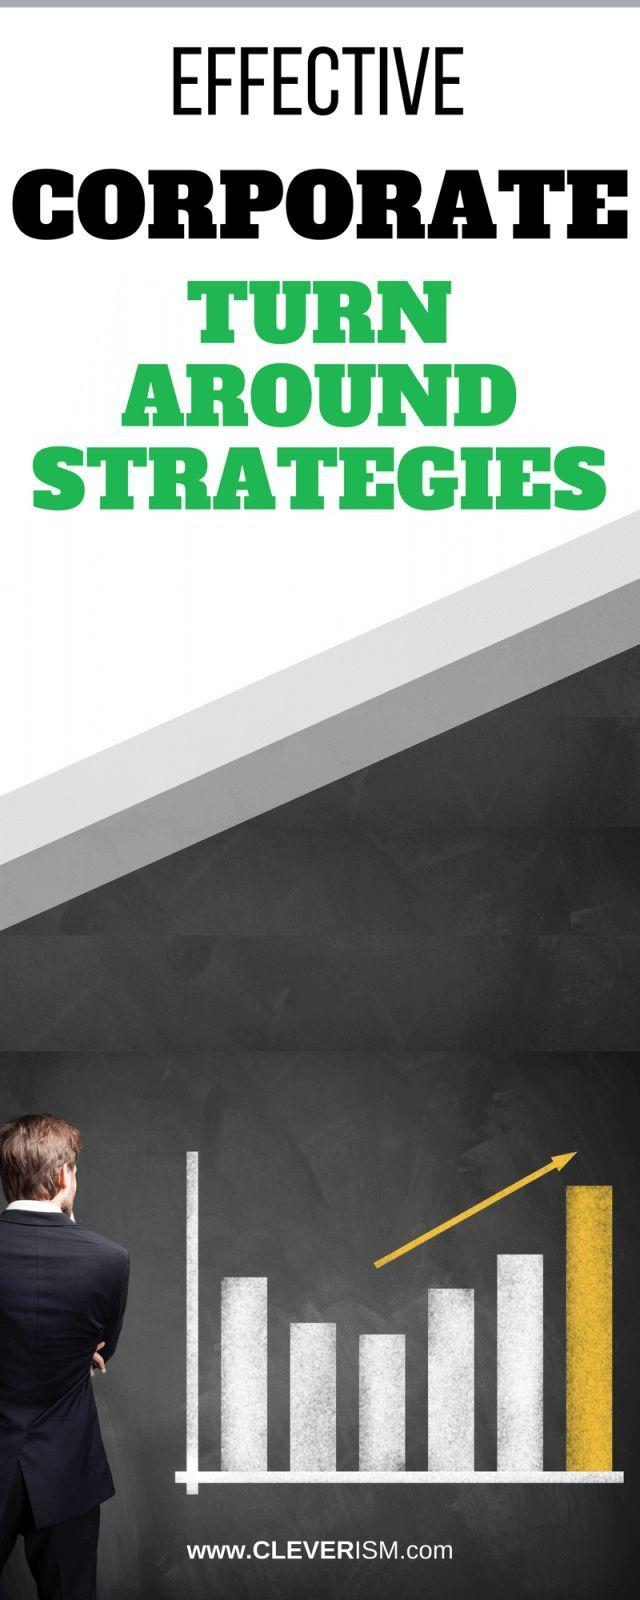 Effective Corporate Turnaround Strategies Business Growth Strategies Business Strategy Management Strategies Working capital requirement calculation excel